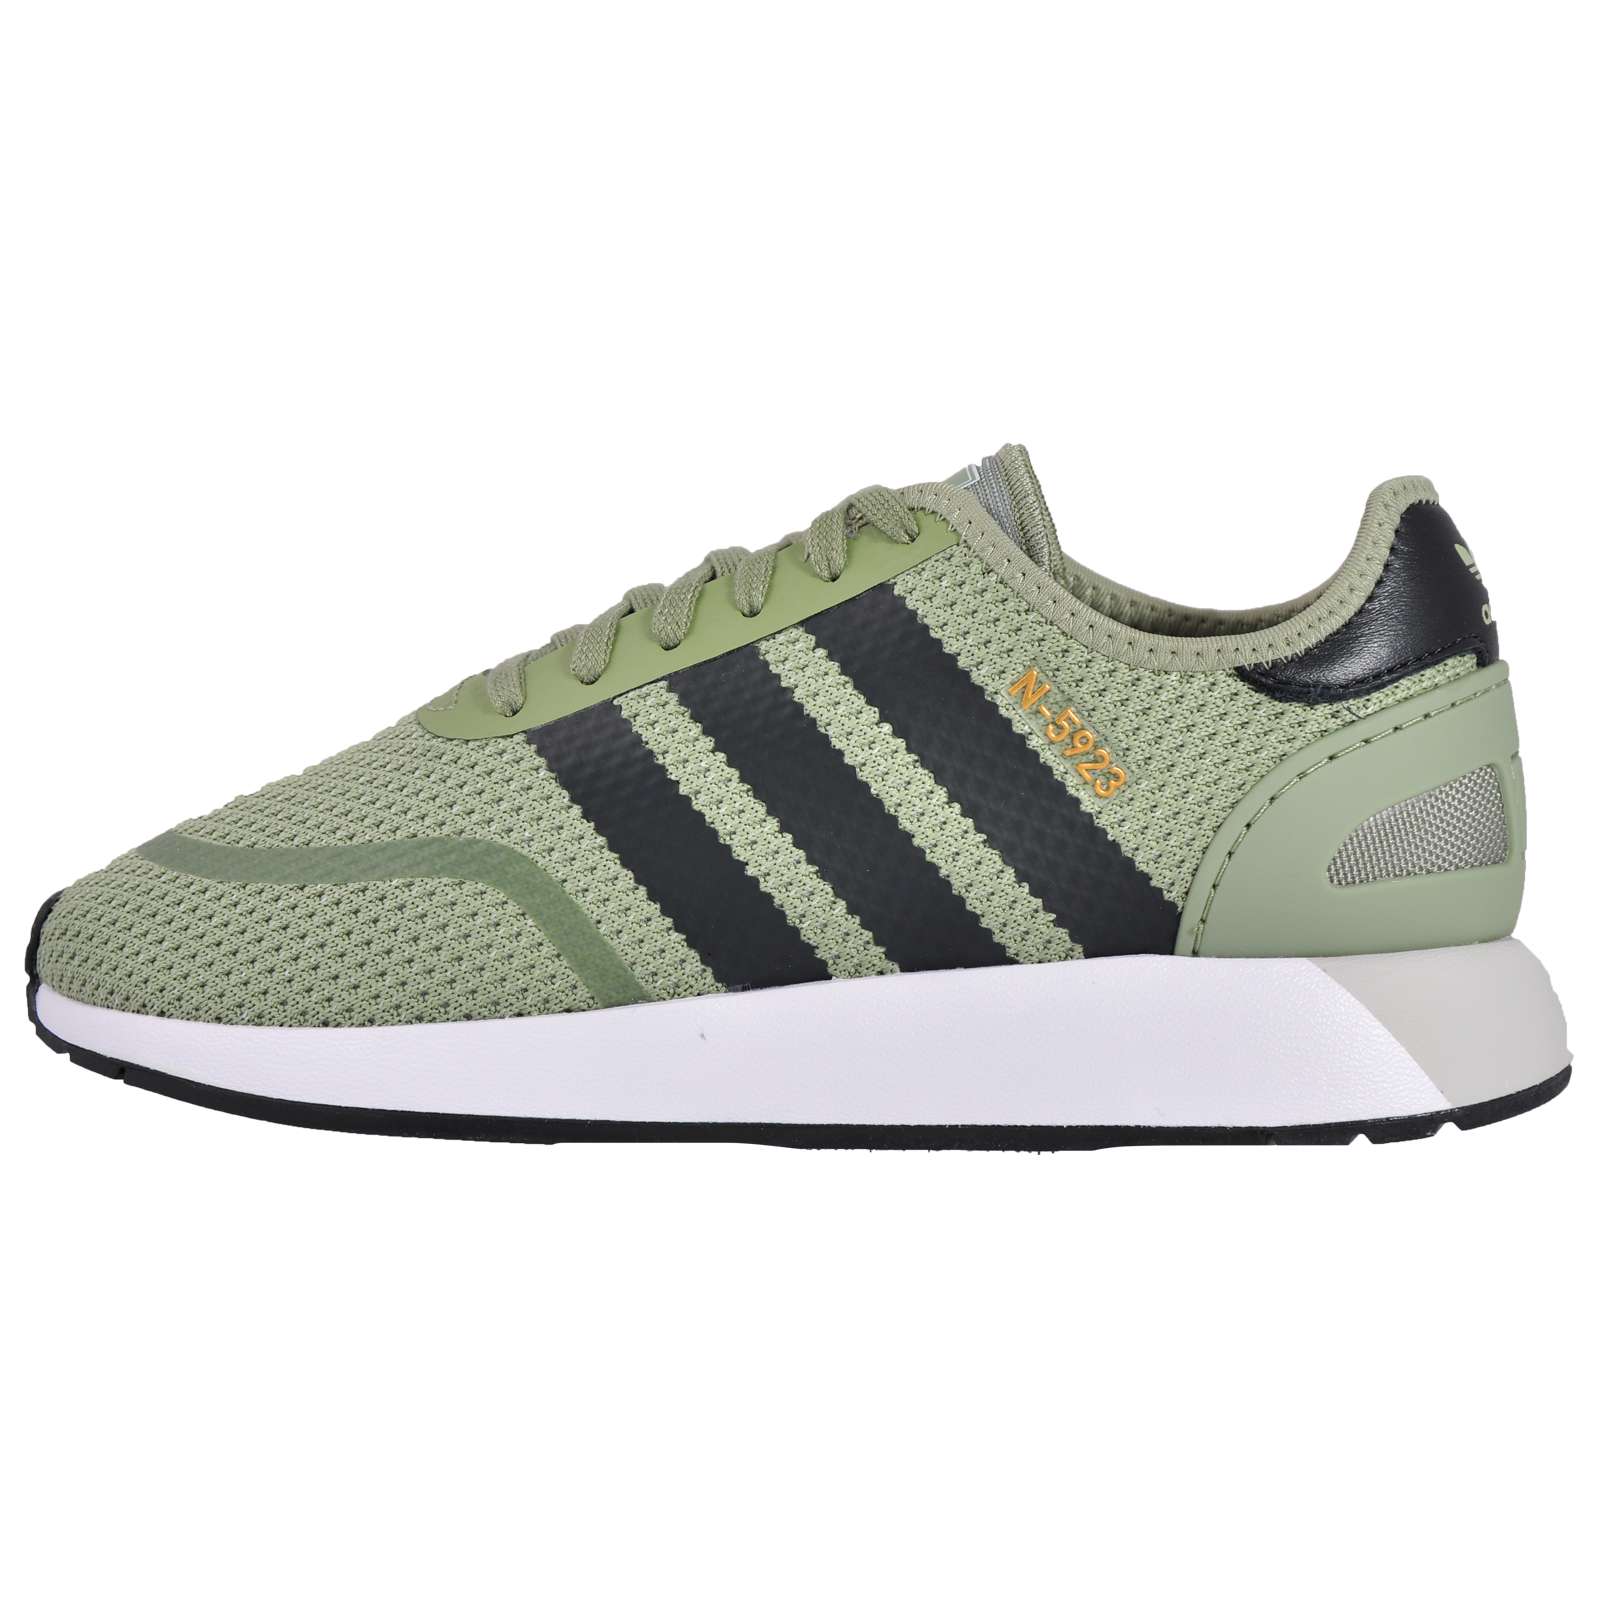 Dettagli su Adidas Originals Iniki N 5923 Classico da Uomo Heritage Moda Retrò Scarpe Verde